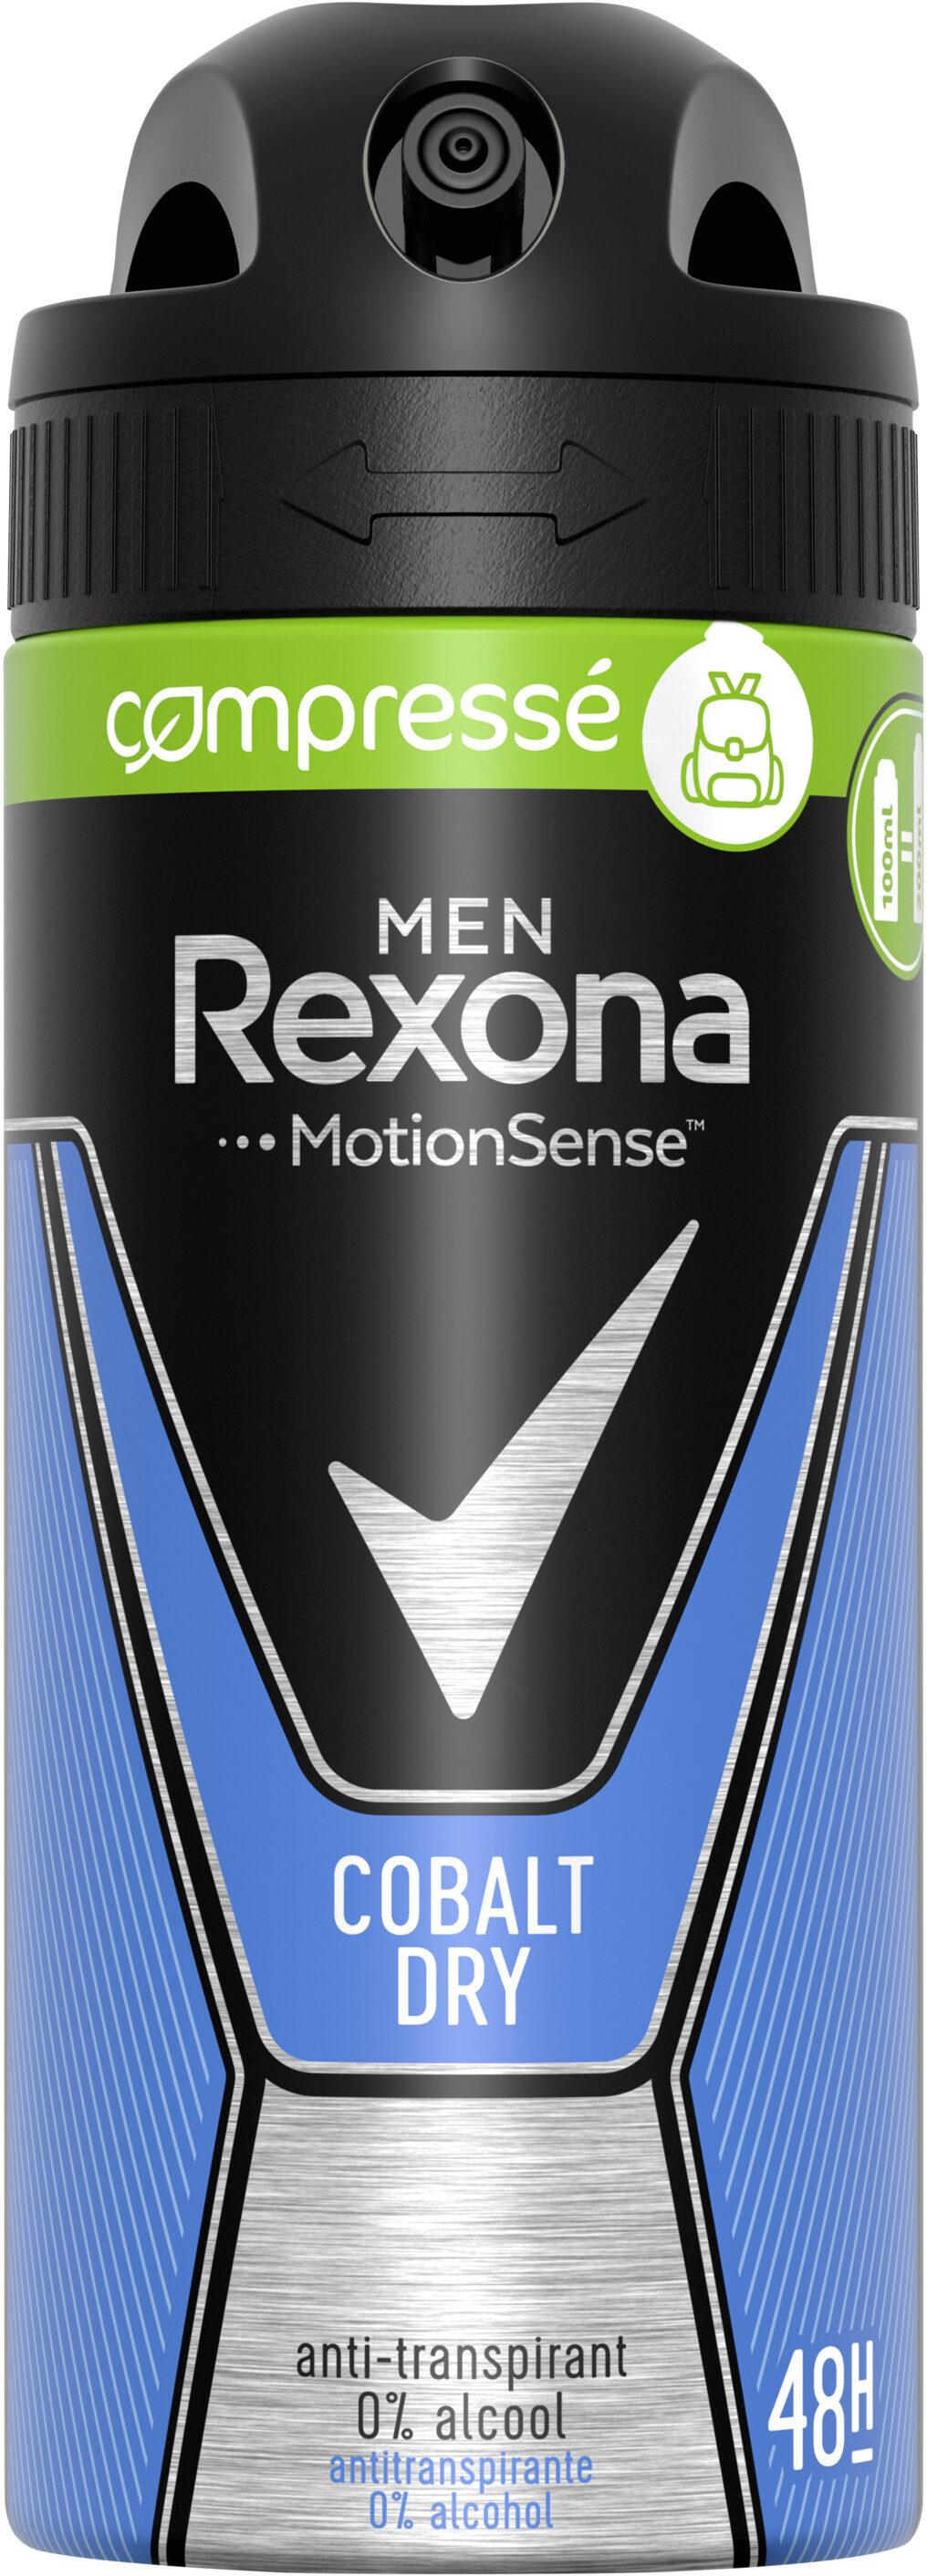 REXONA MEN Déodorant Anti-Transpirant Spray Compressé Cobalt Dry - Product - fr